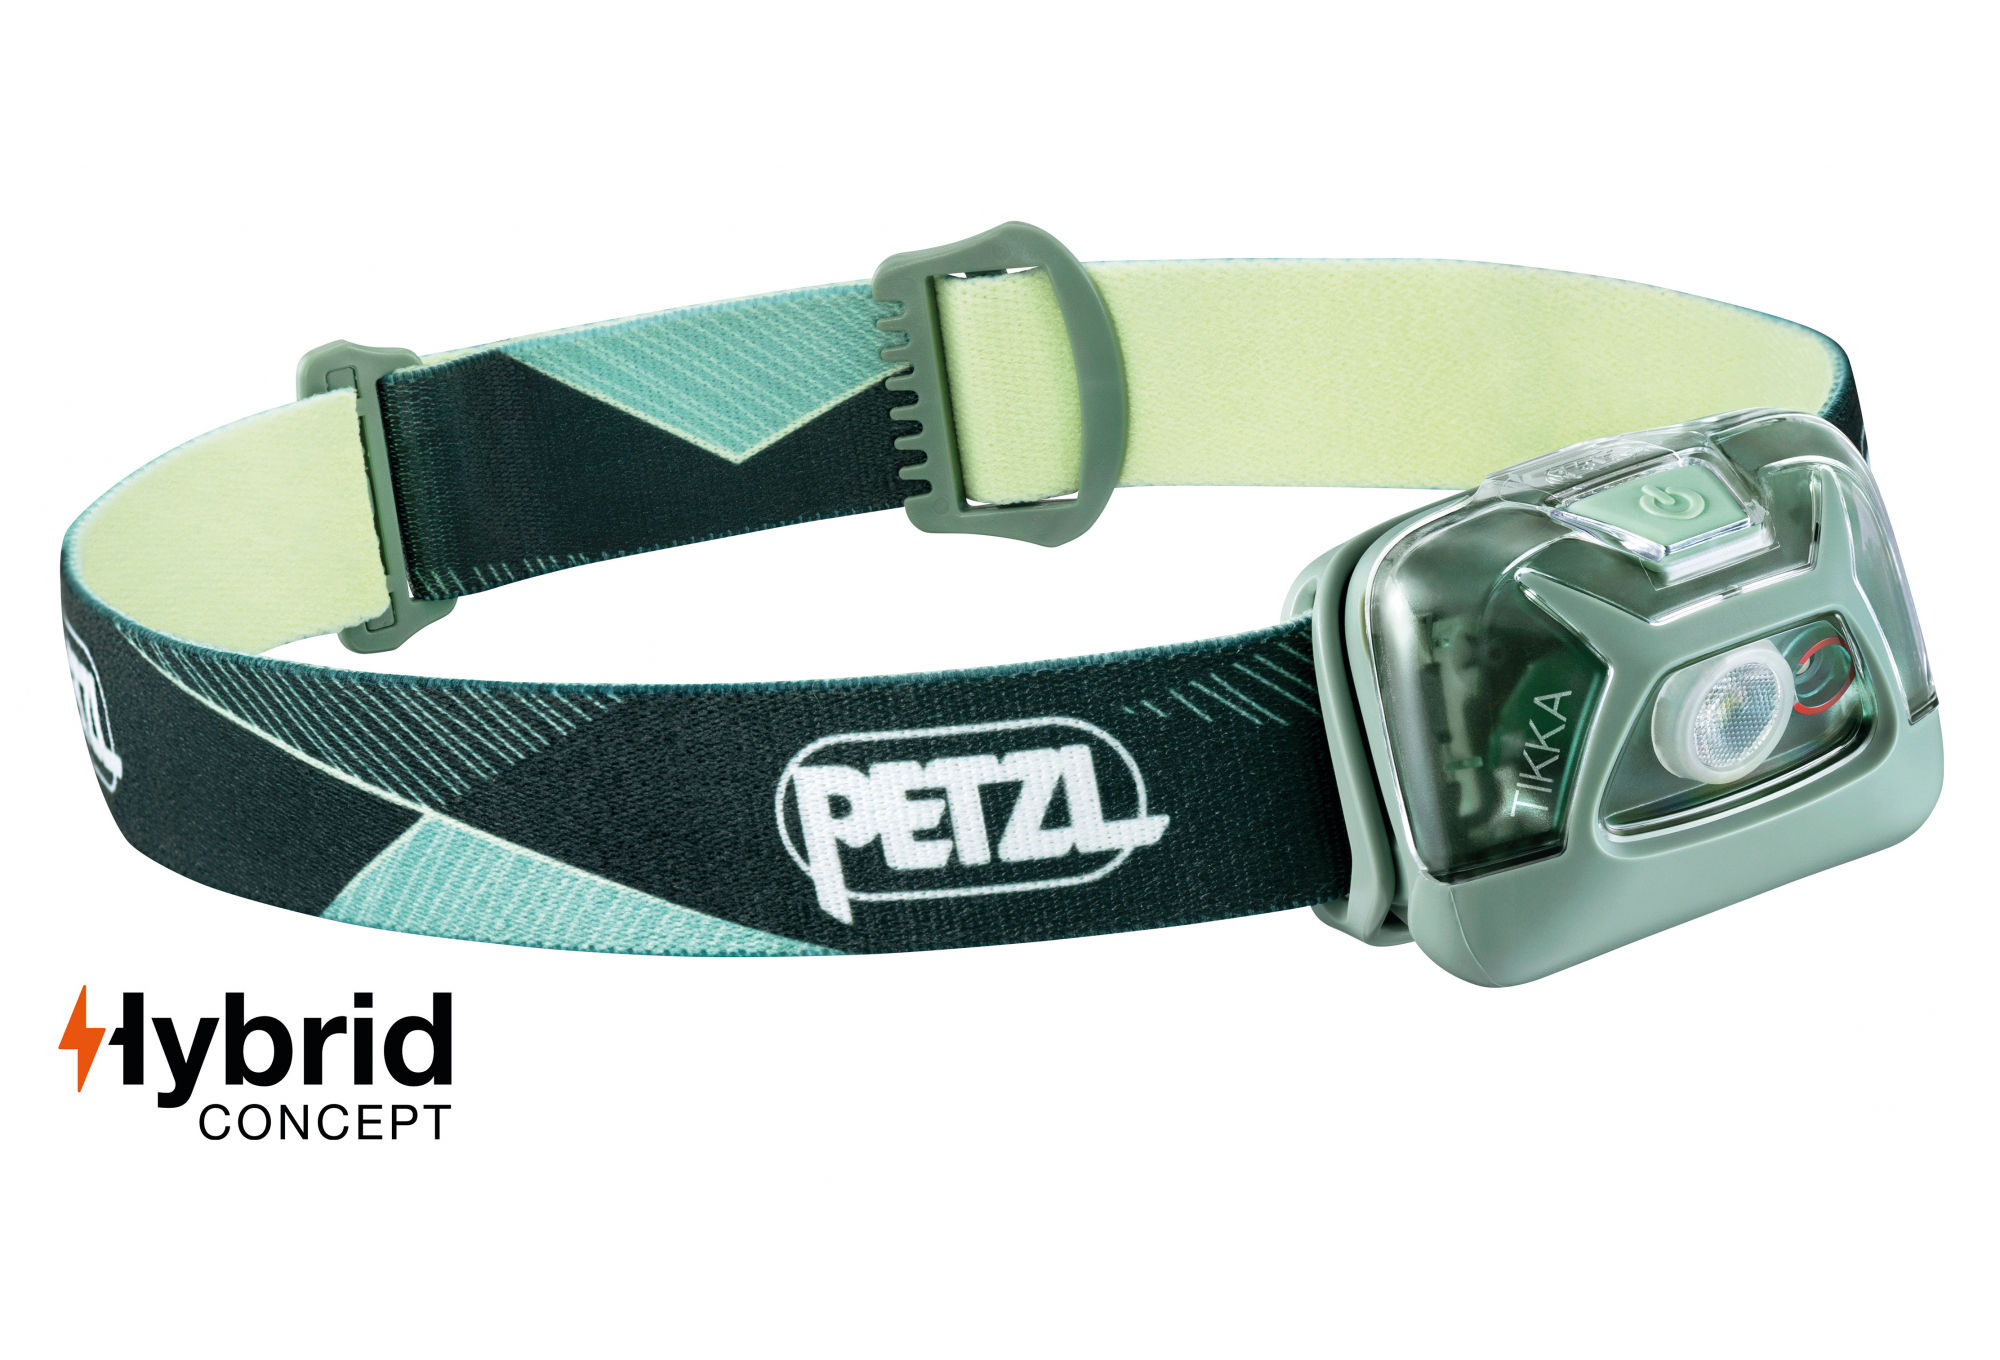 Headlamp for proximity lighting and some movement 200 lumen Petzl TIKKA HYBRID